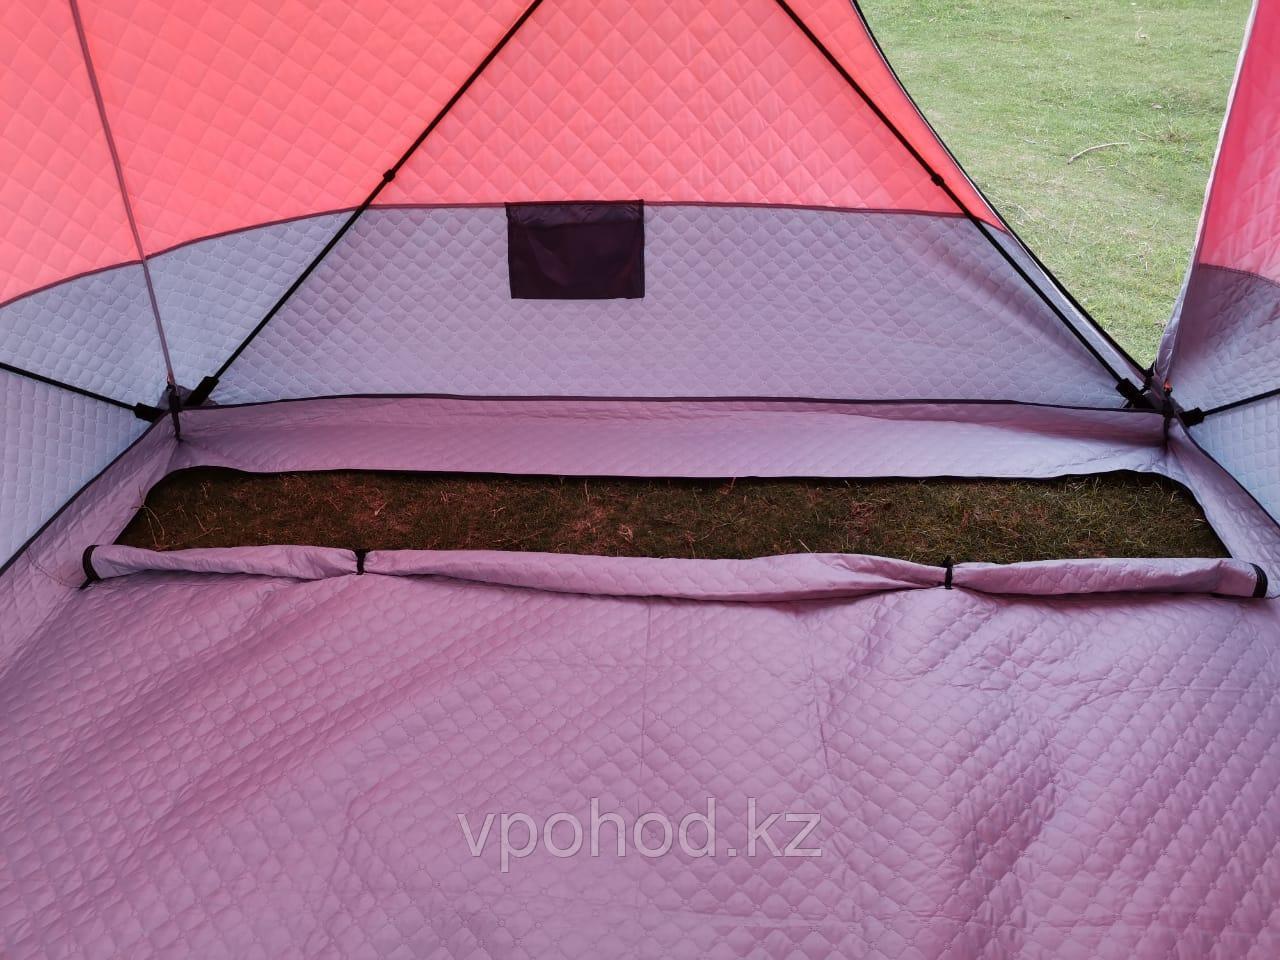 Пол для палатки Mimir 2019